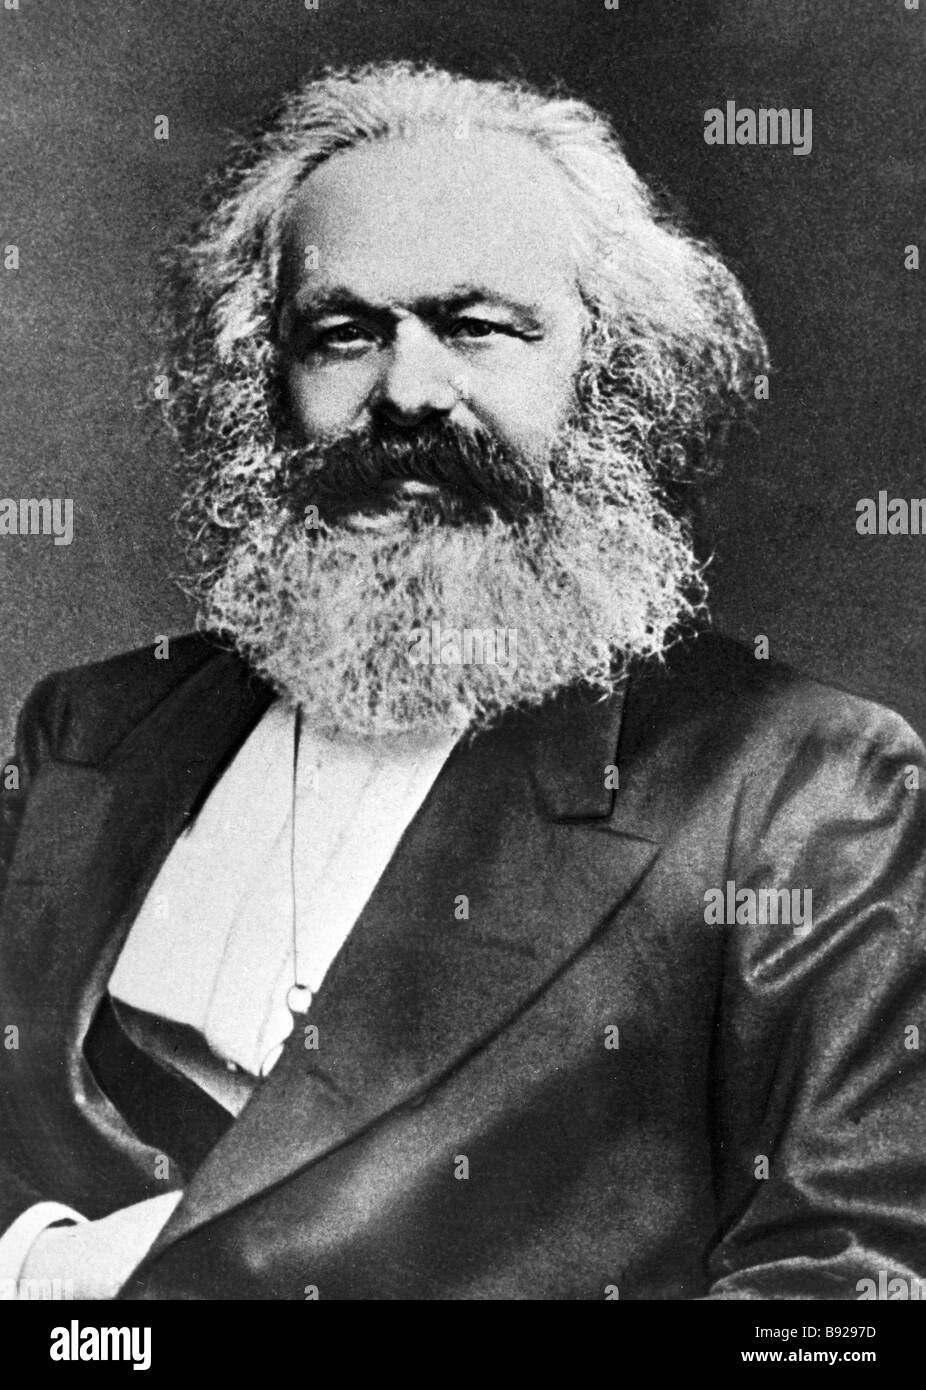 Karl Marx founder of scientific communism 1818 1883 - Stock Image